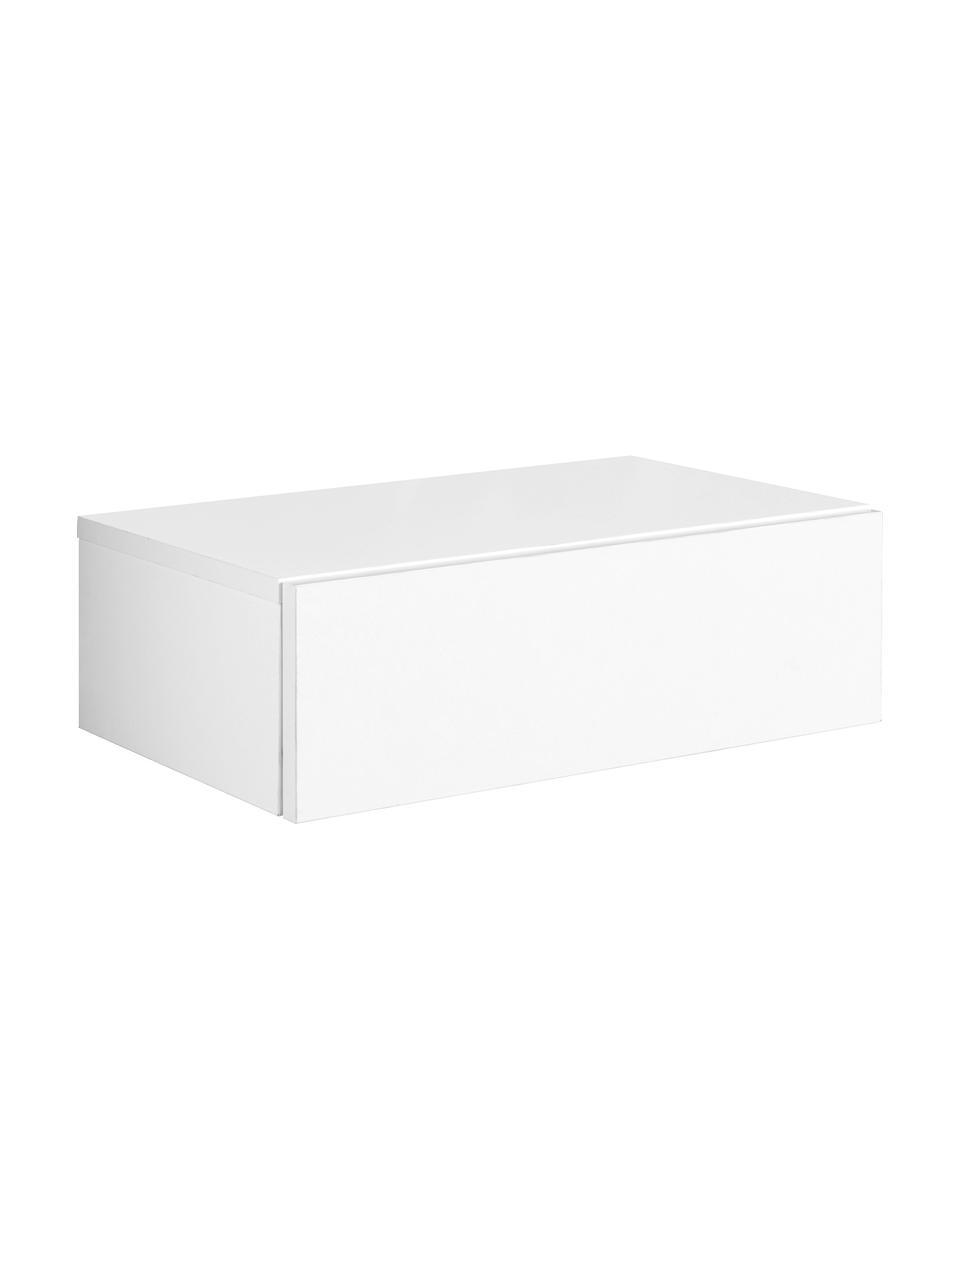 Comodino a muro con cassetto Dream, Bianco, Larg. 46 x Alt. 15 cm